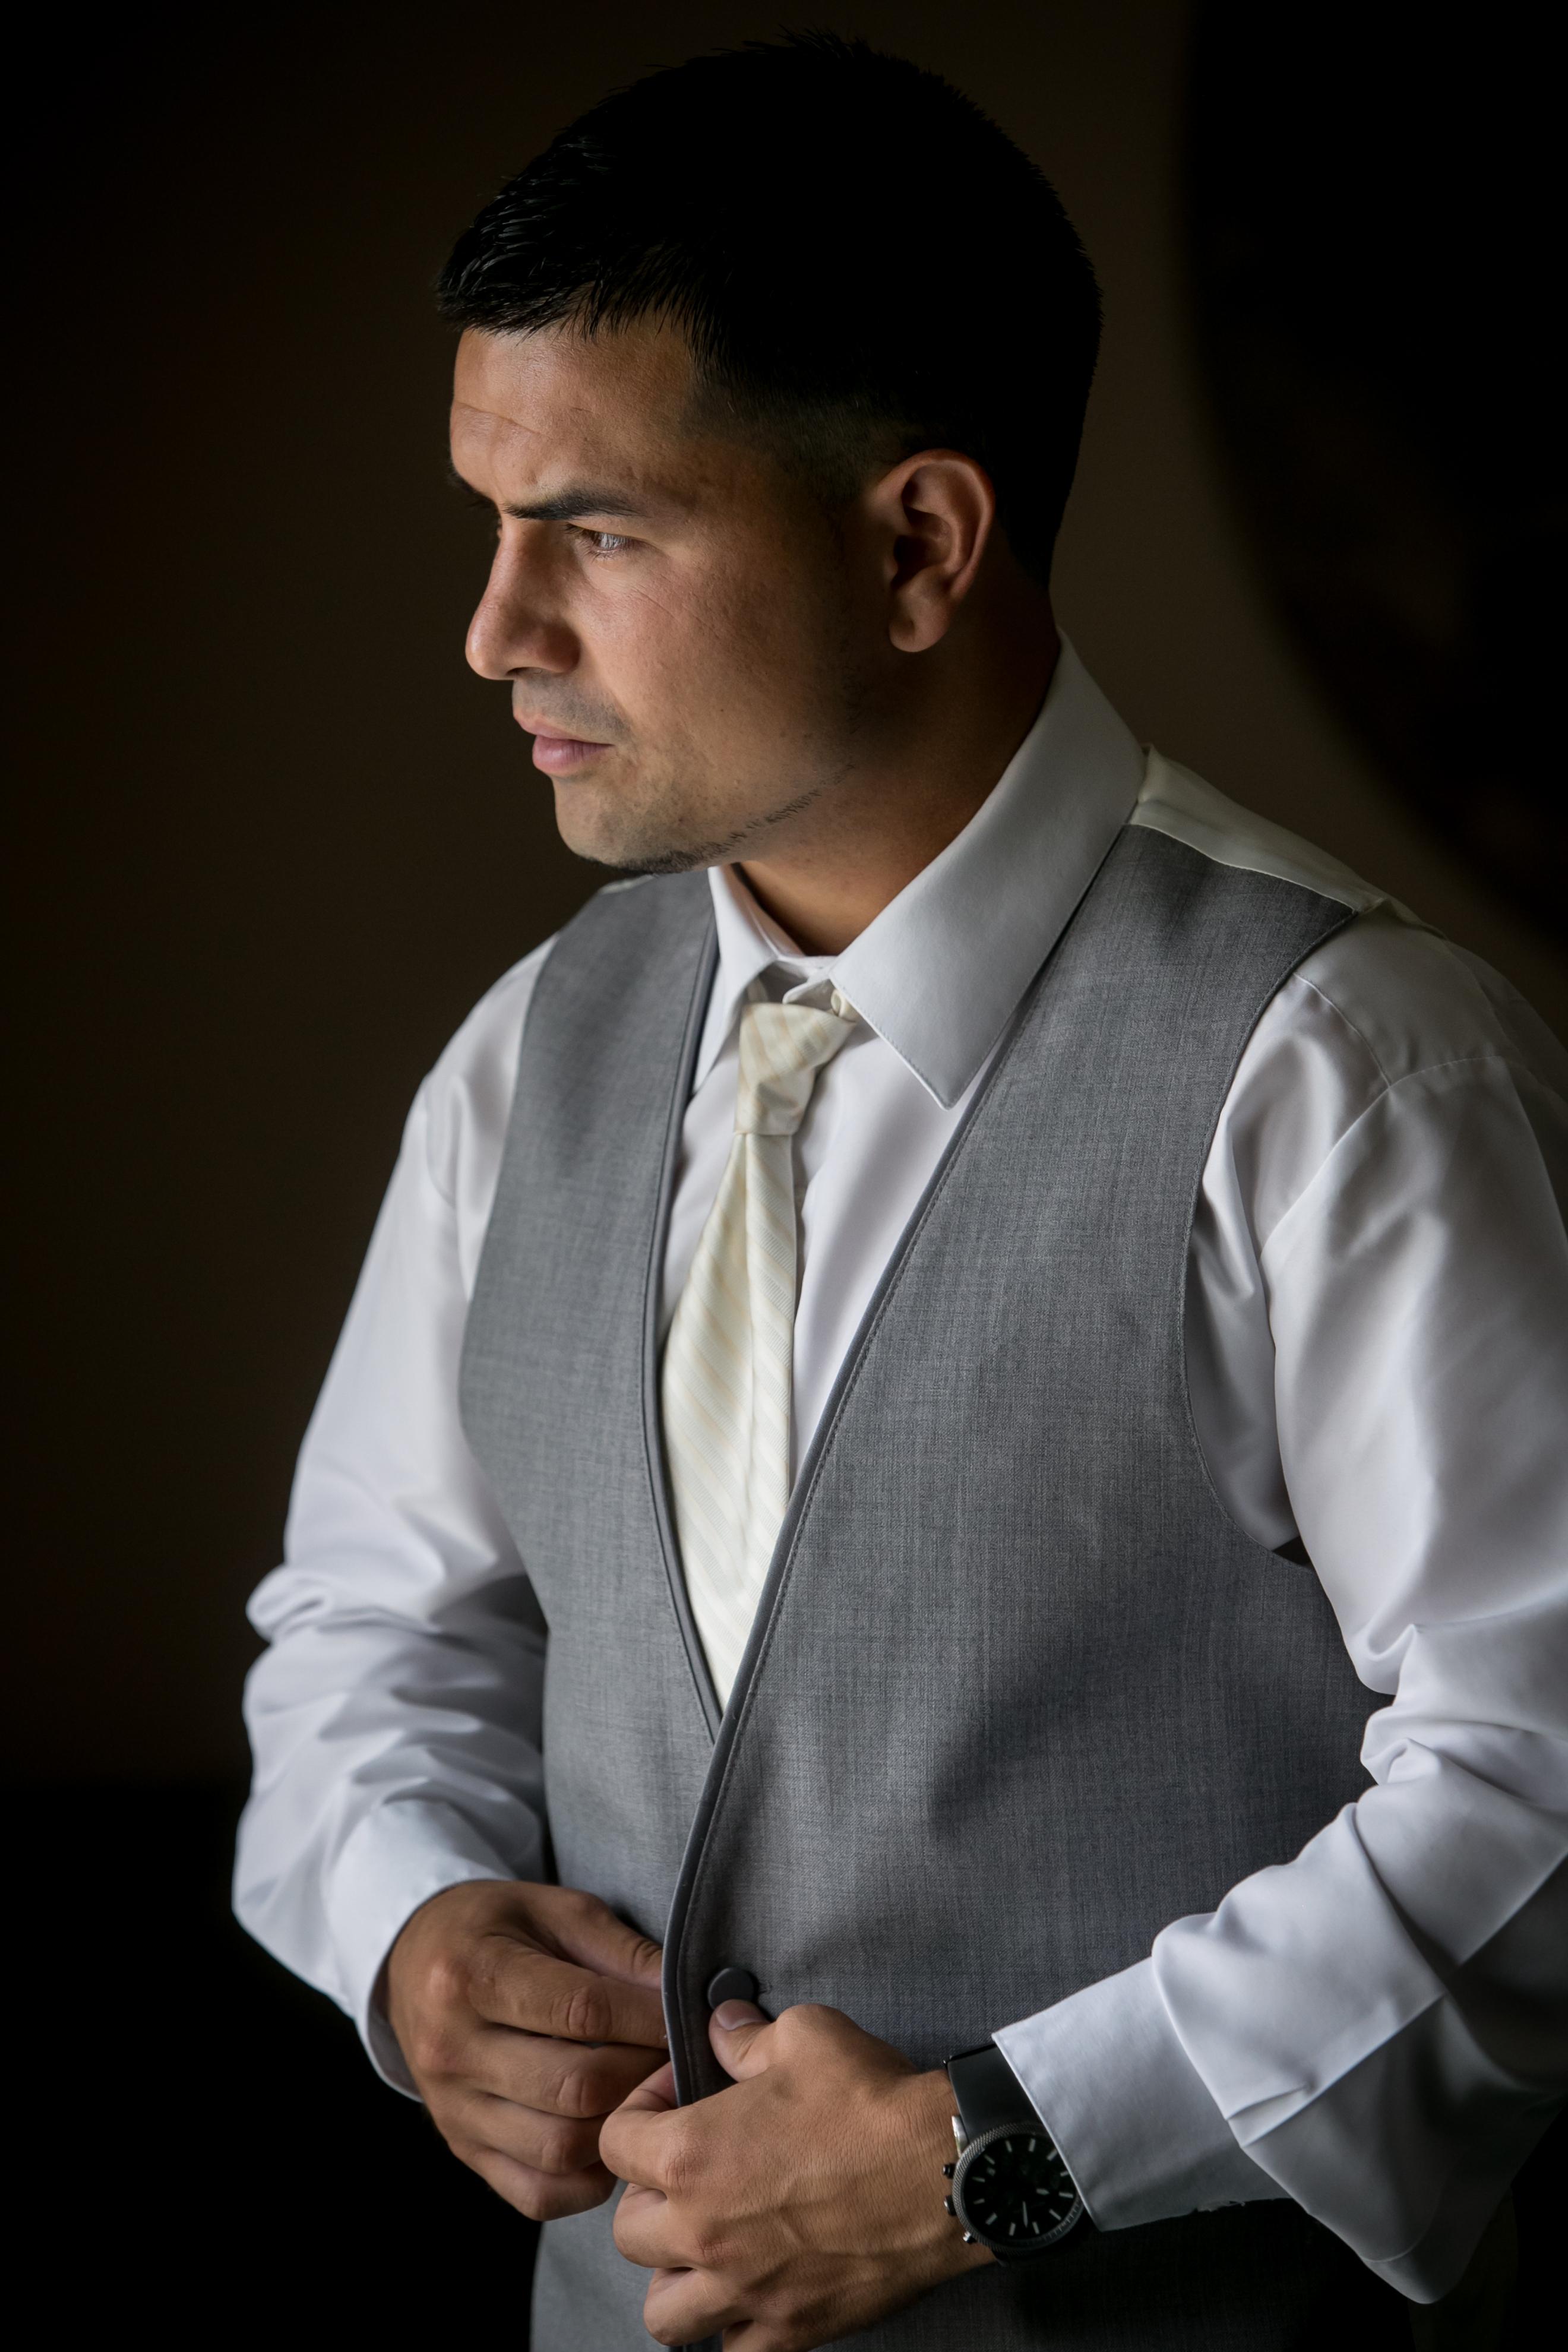 Groom Prep: Buttoning the Vest